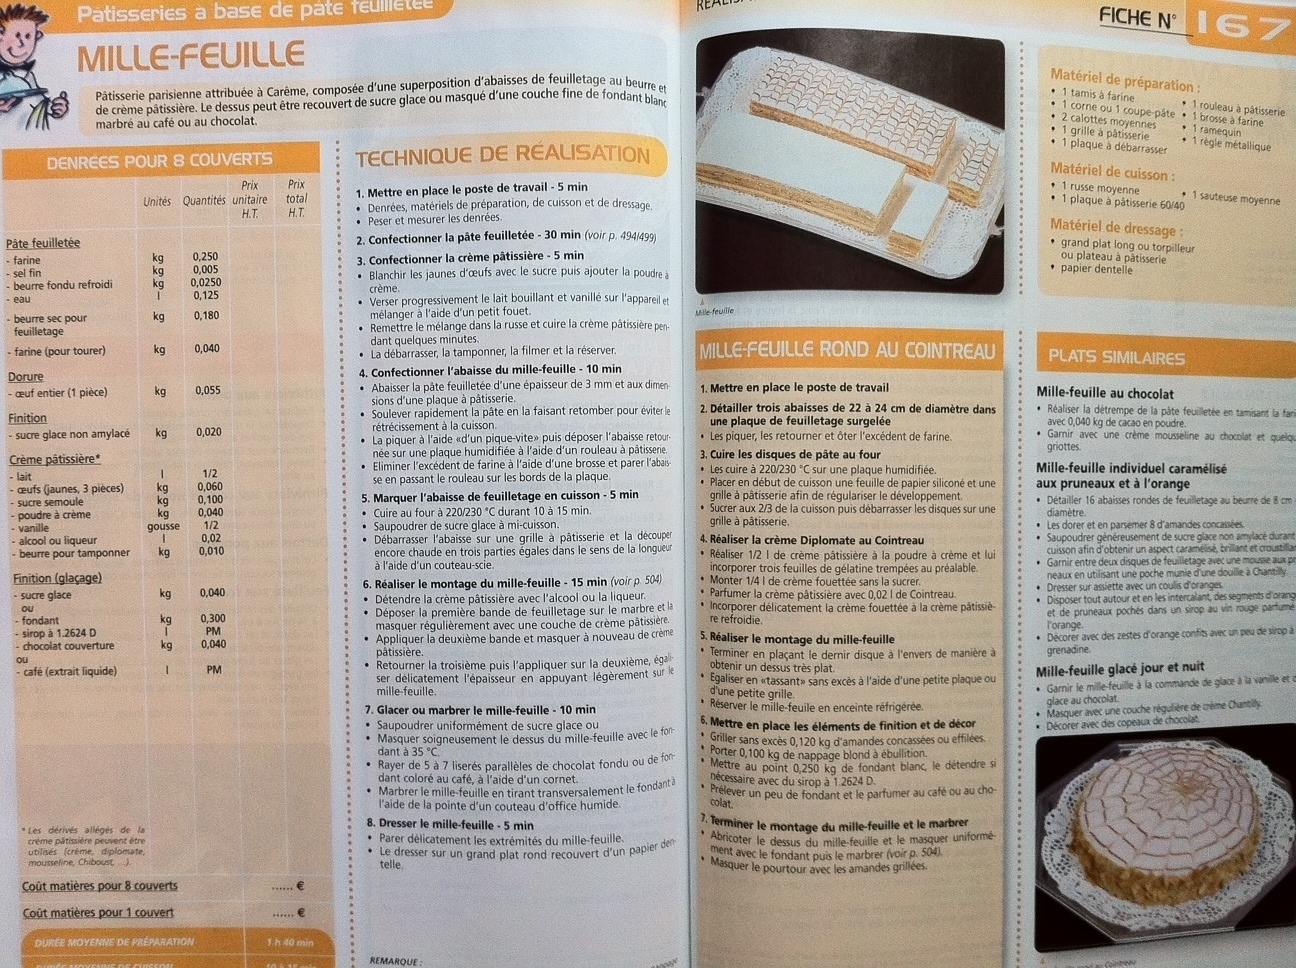 miscelanea culinaria: la cuisine de reference. imprescindible